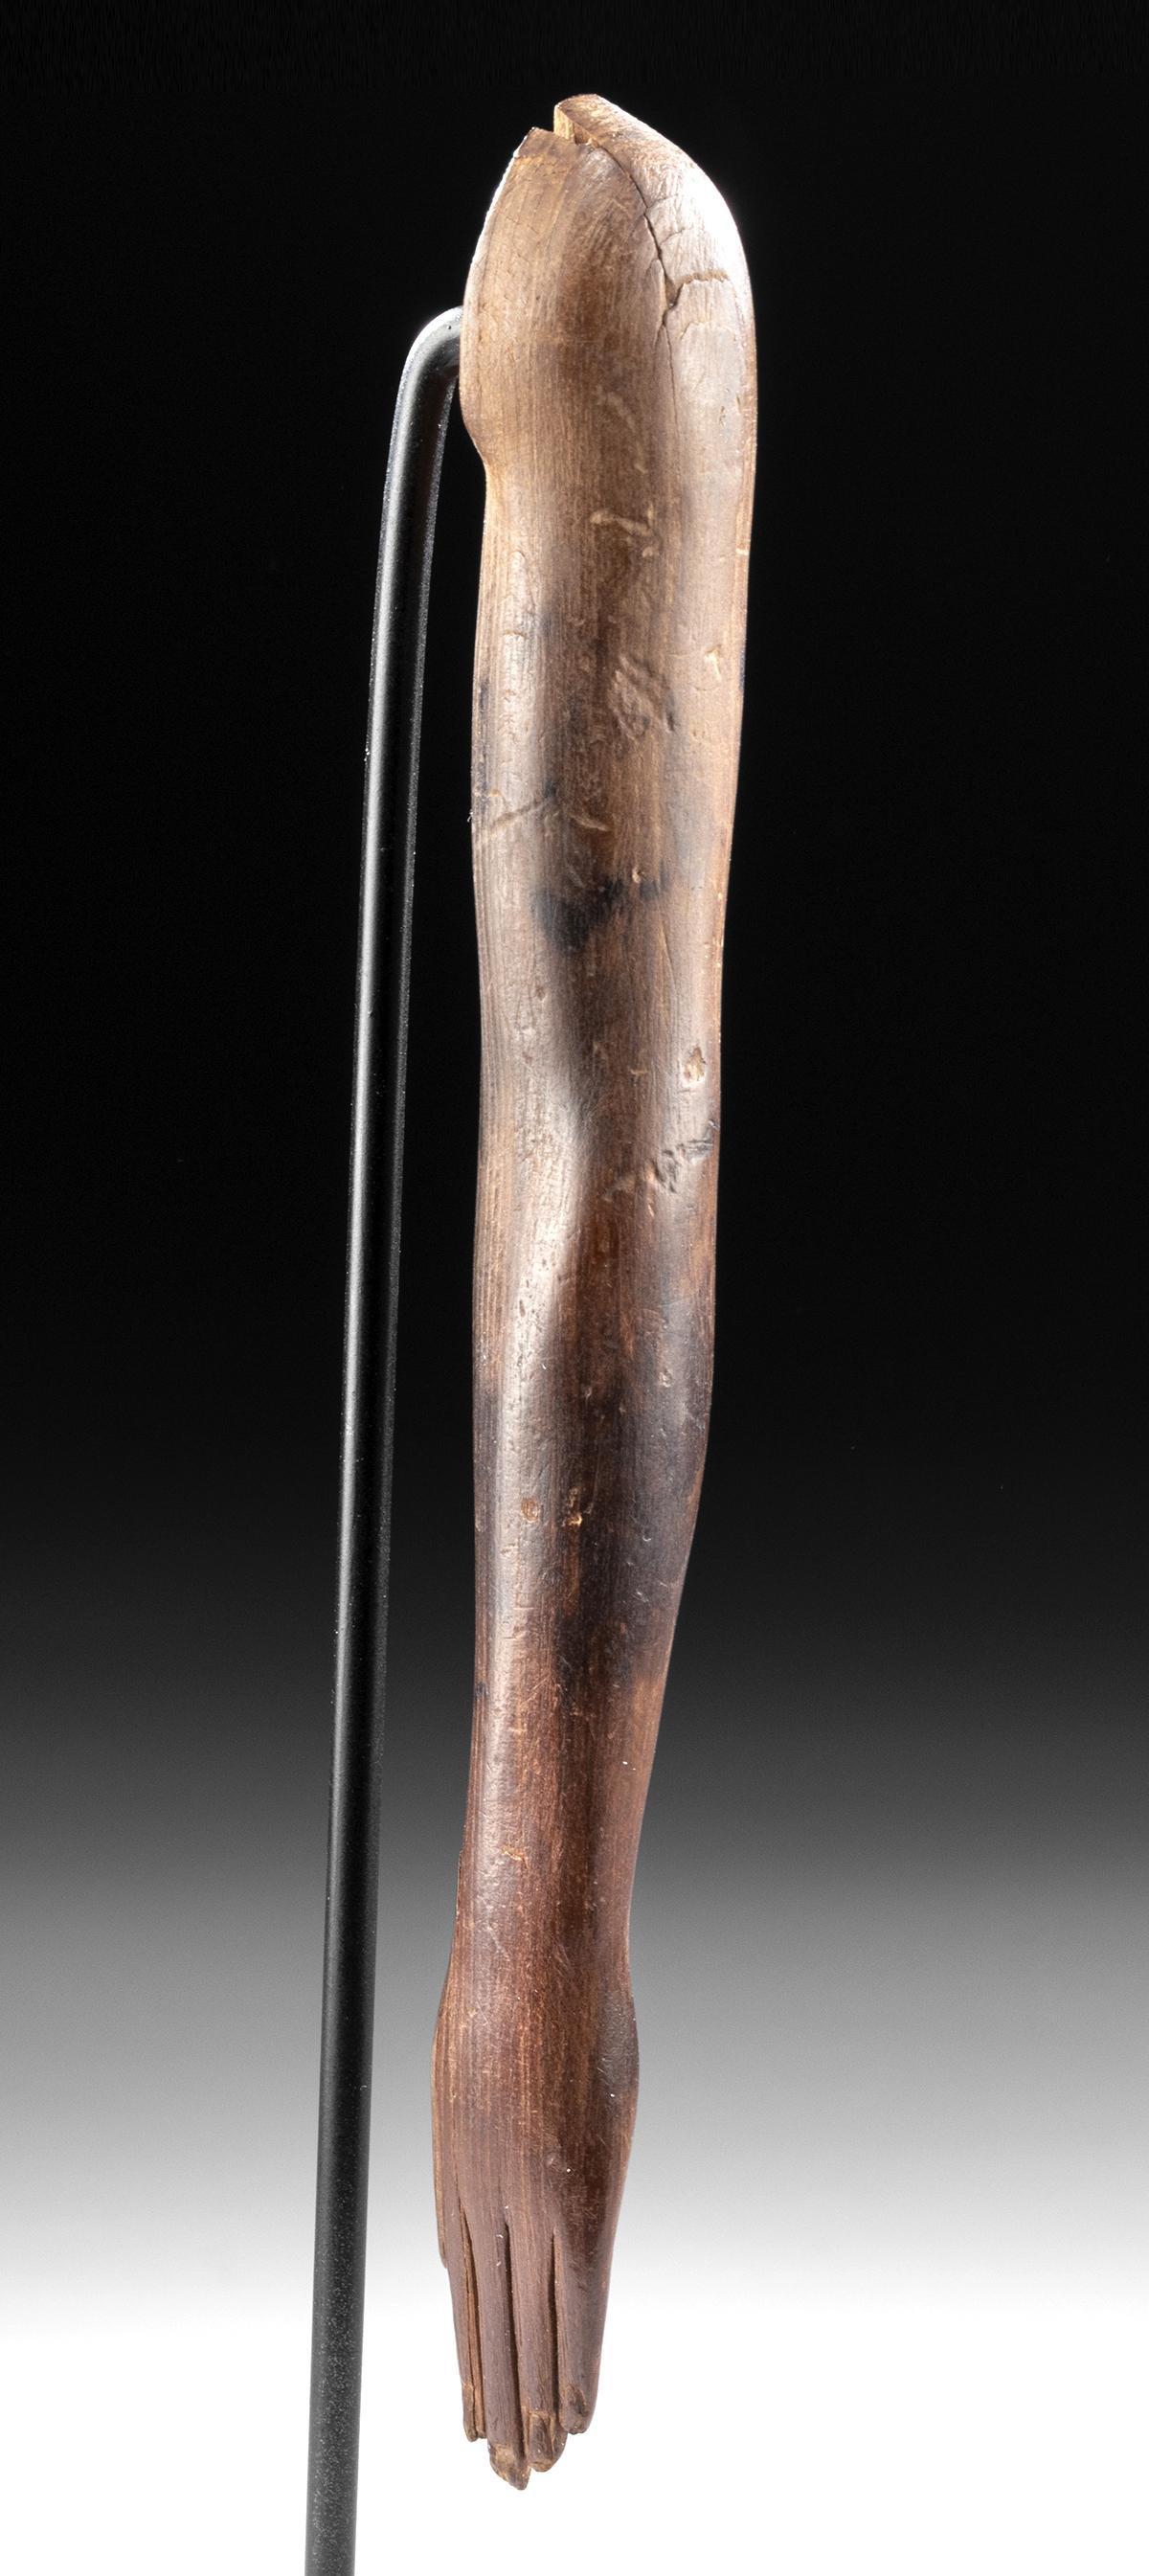 Egyptian Wood Left Arm from Statue - Art Loss Registere